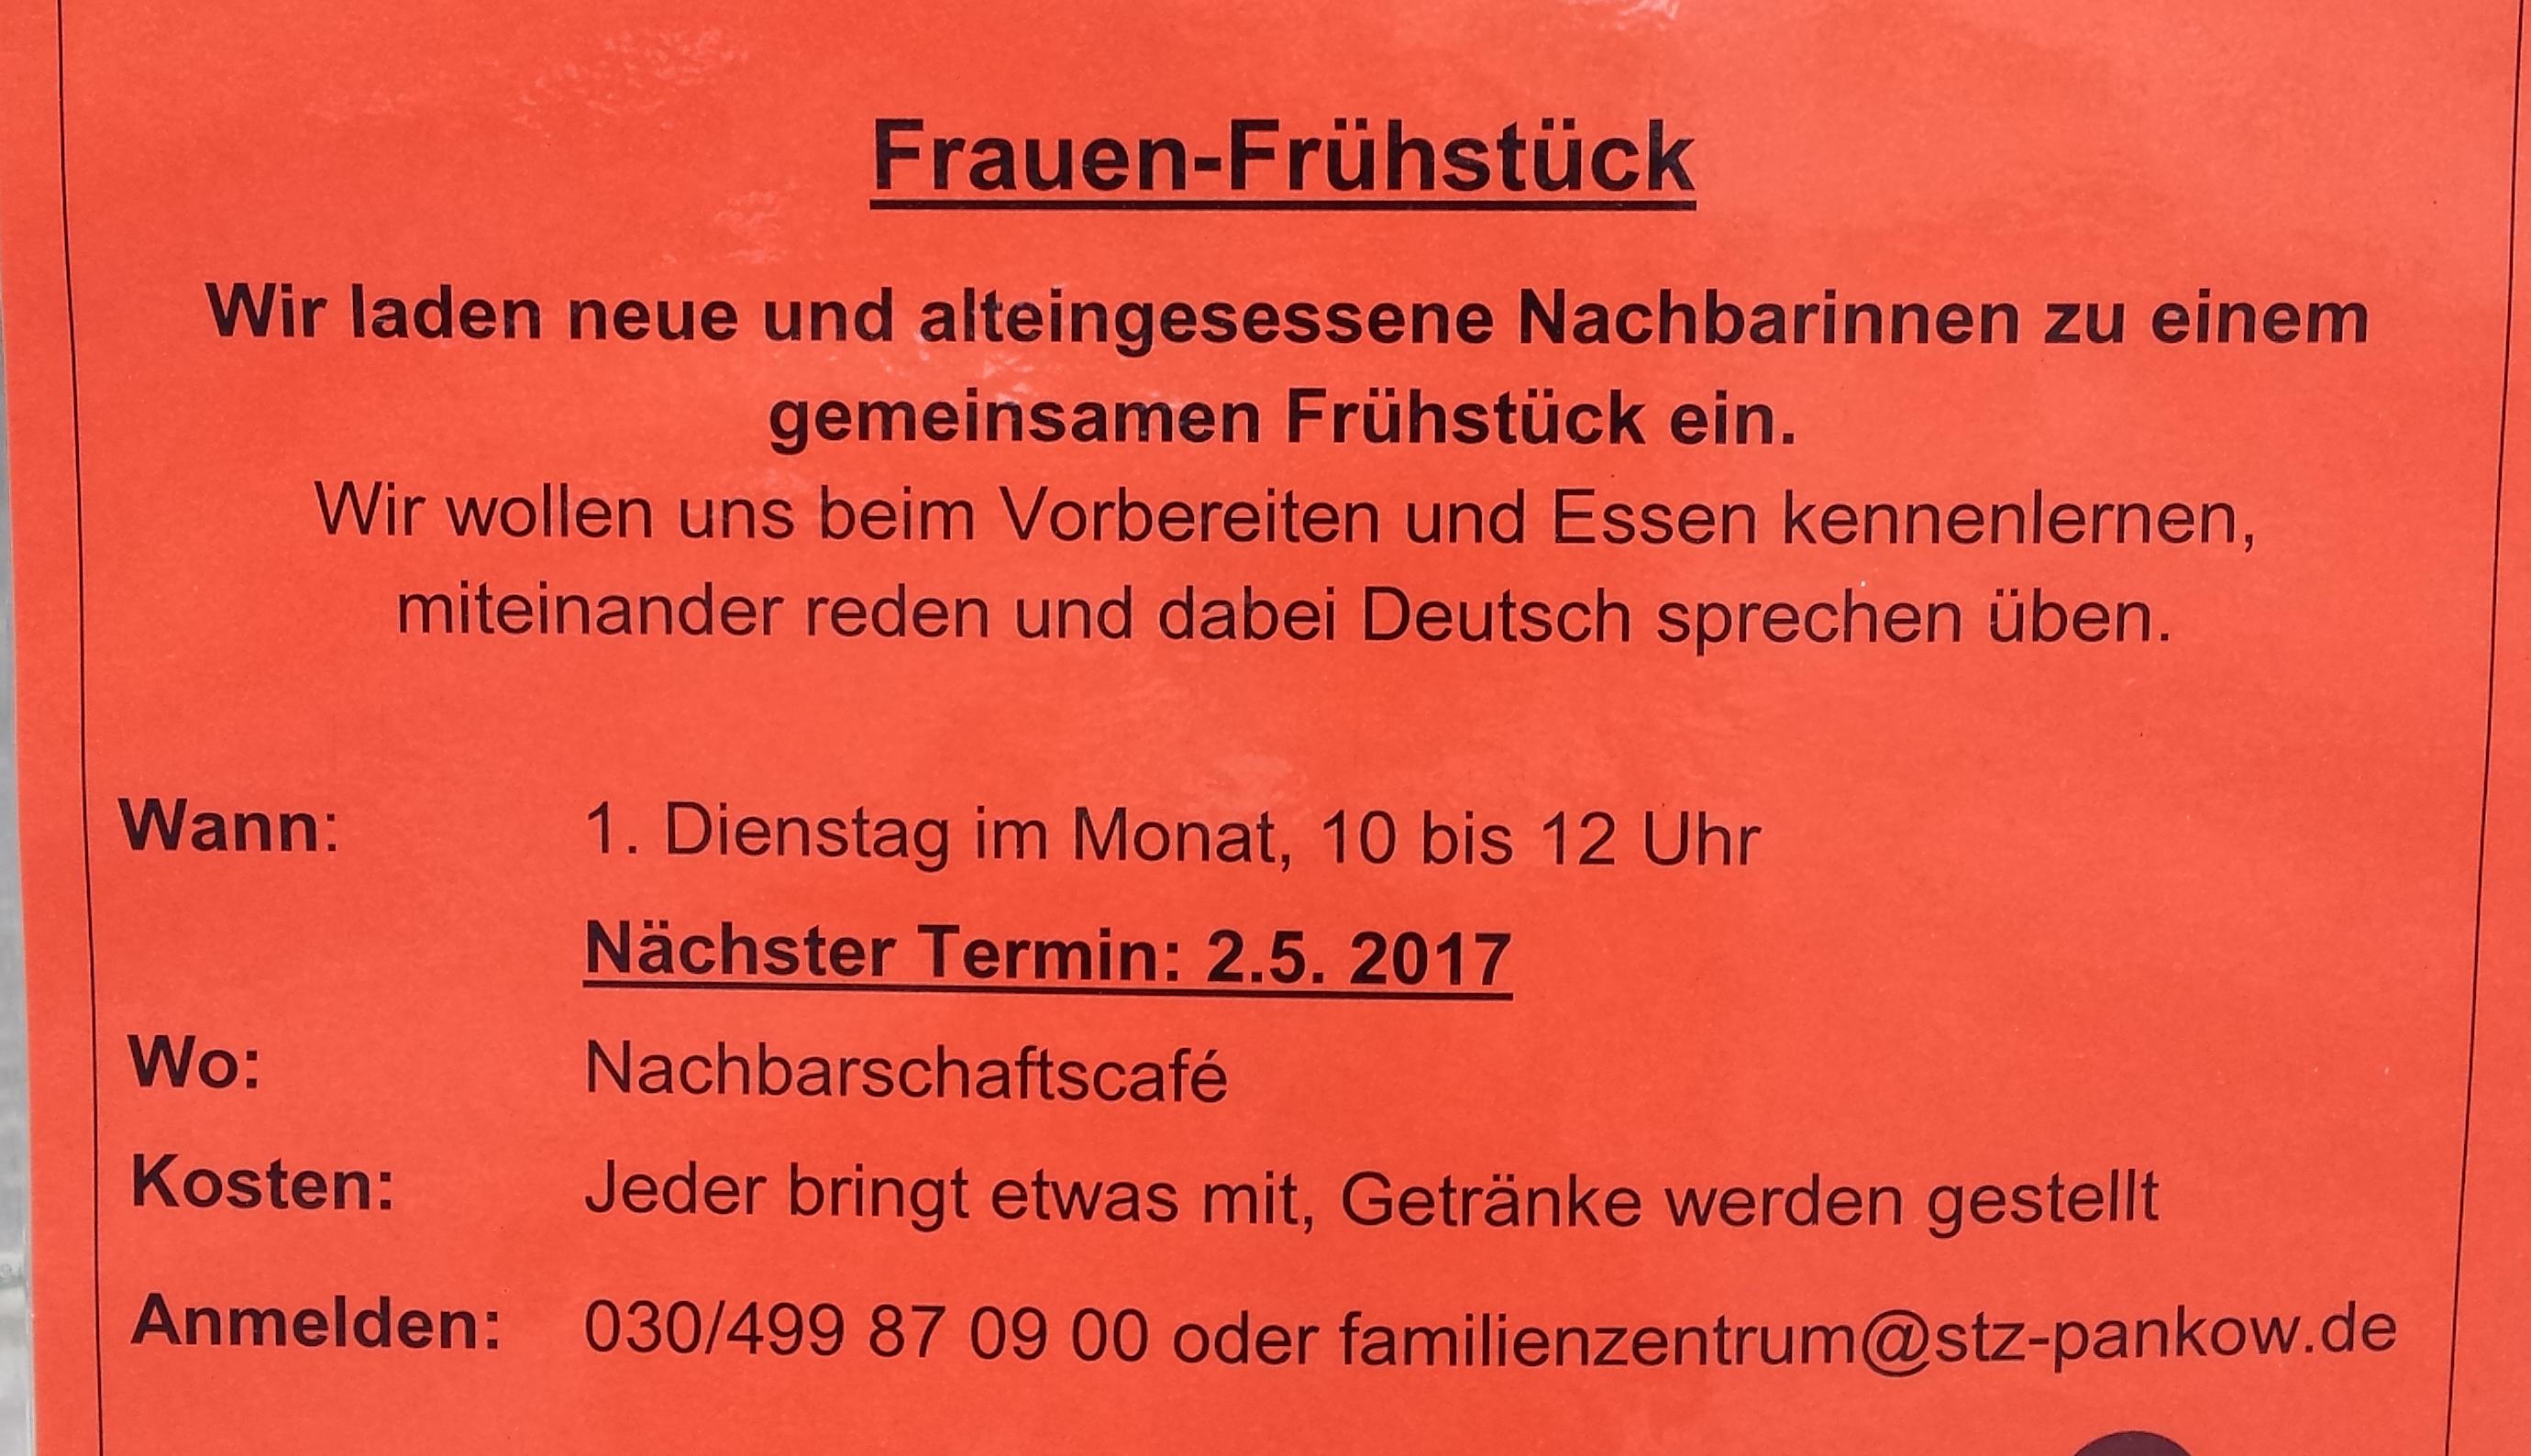 Frauenfrühstück - Berlin - Faktum Magazin